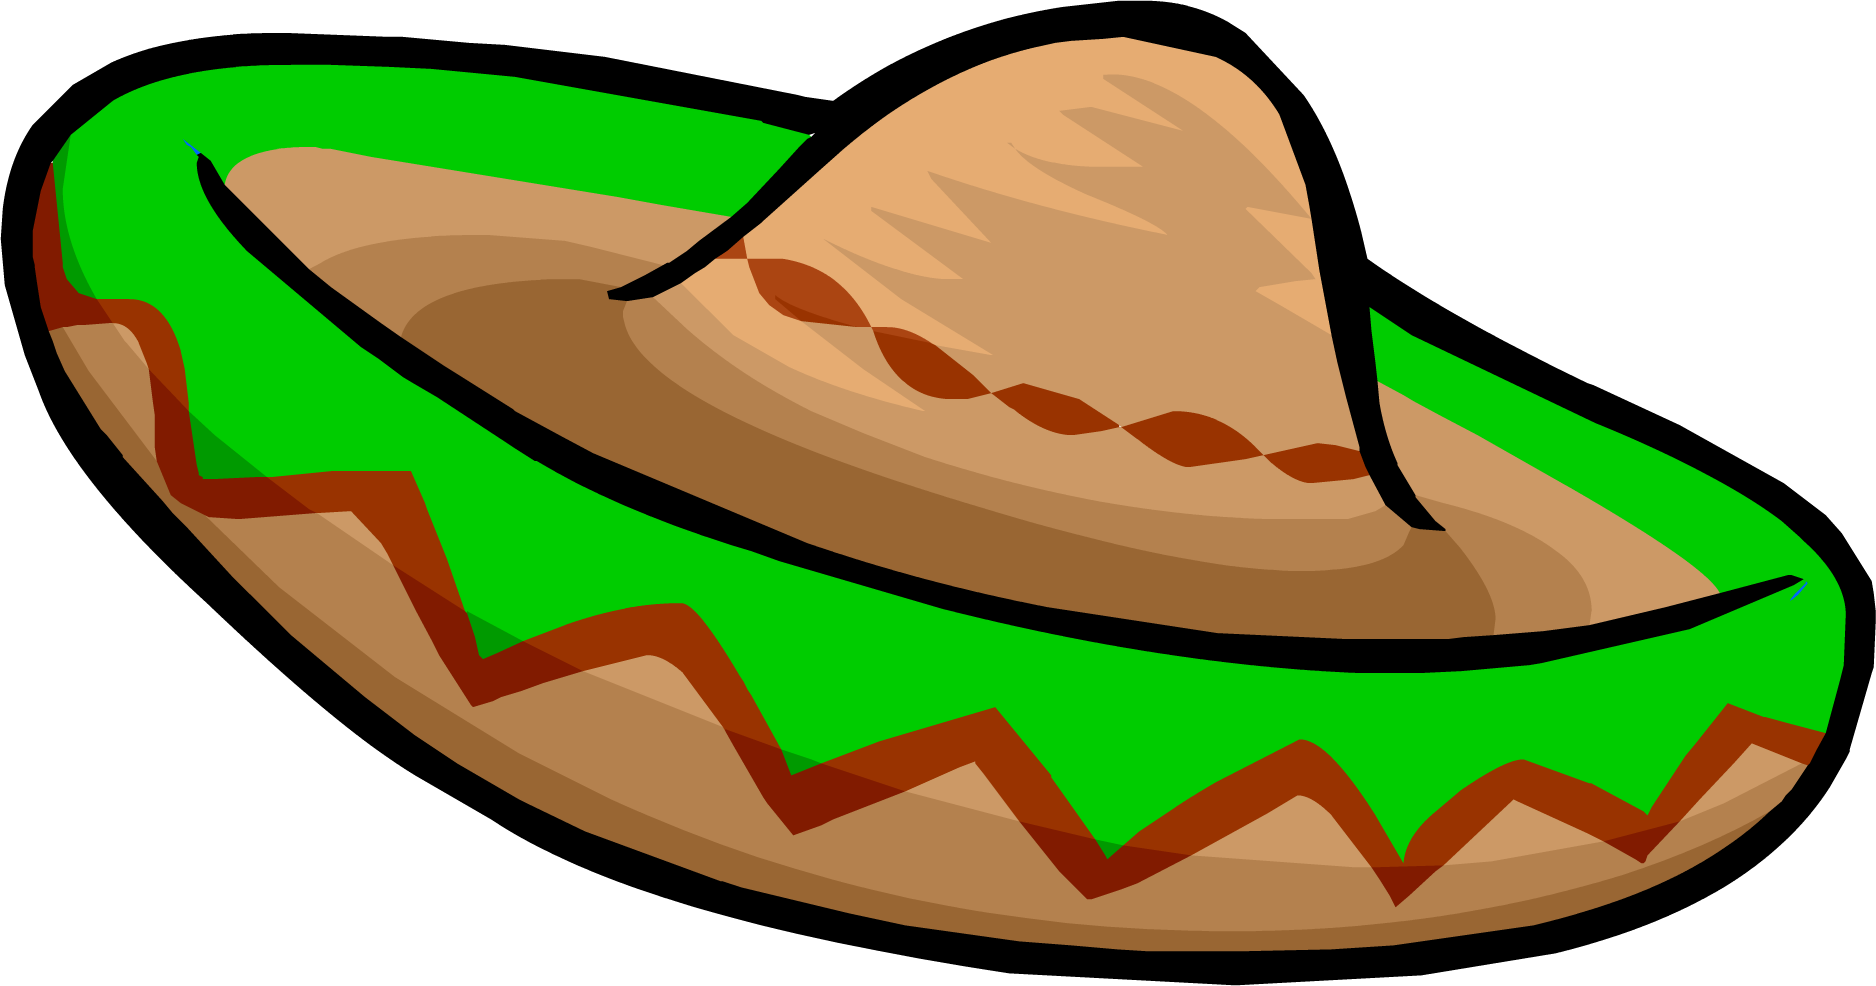 clip art mexican hat - photo #9